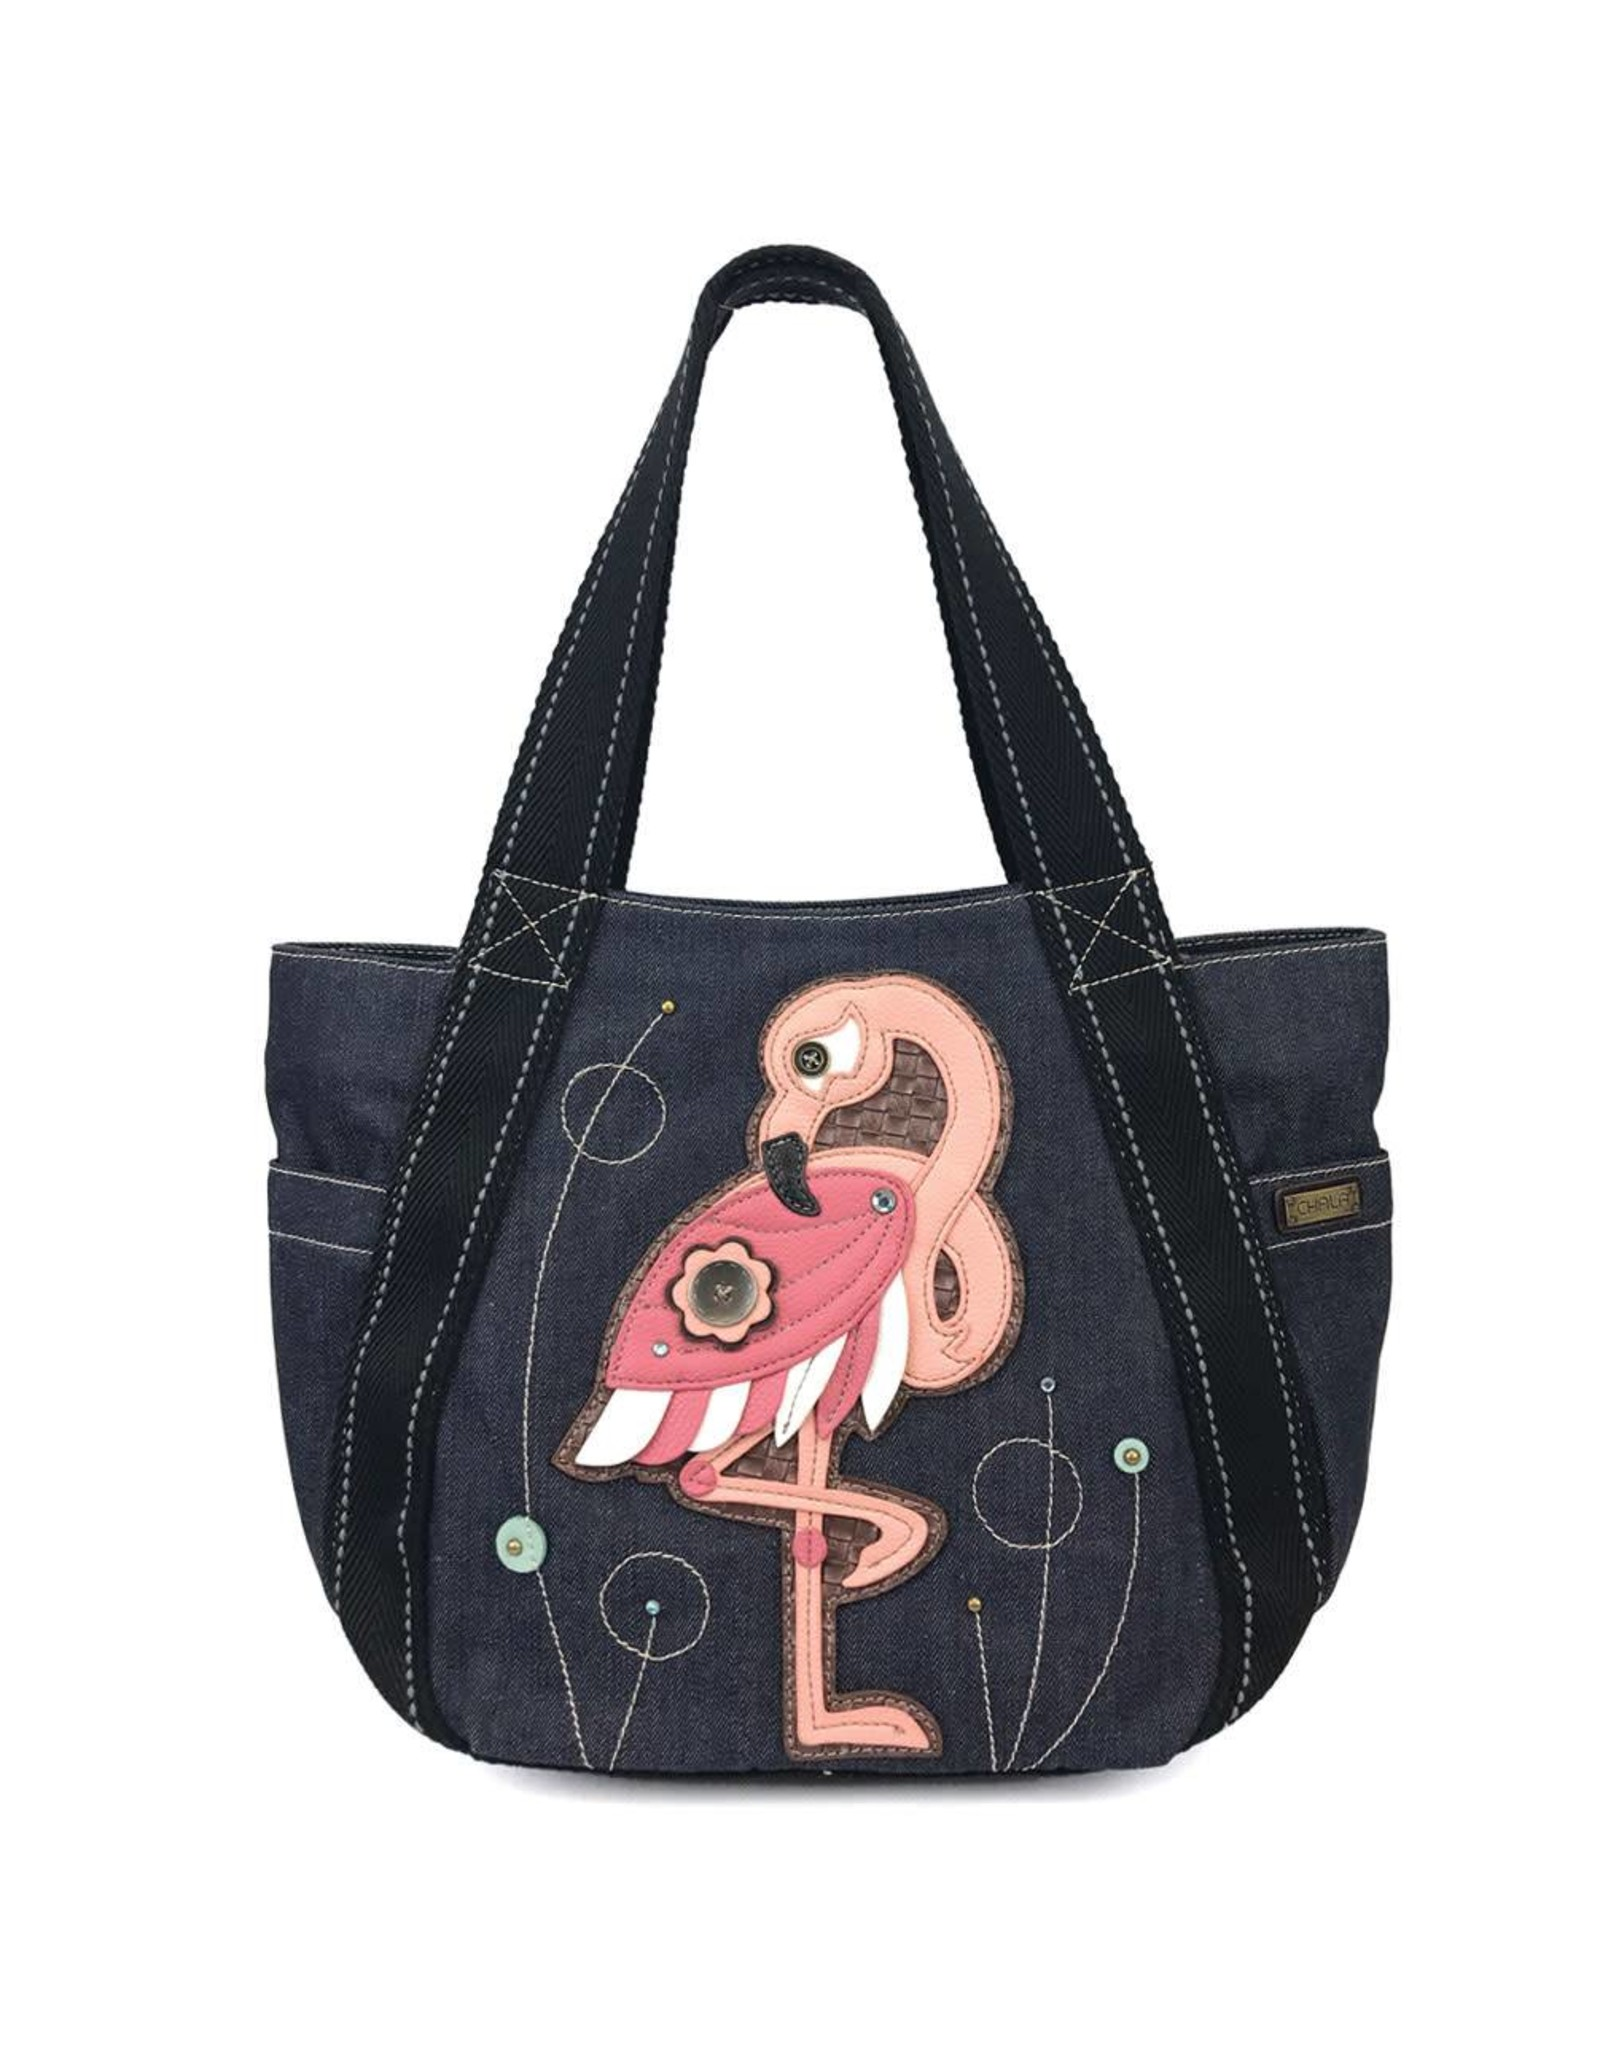 Chala Carryall Zip Tote Flamingo